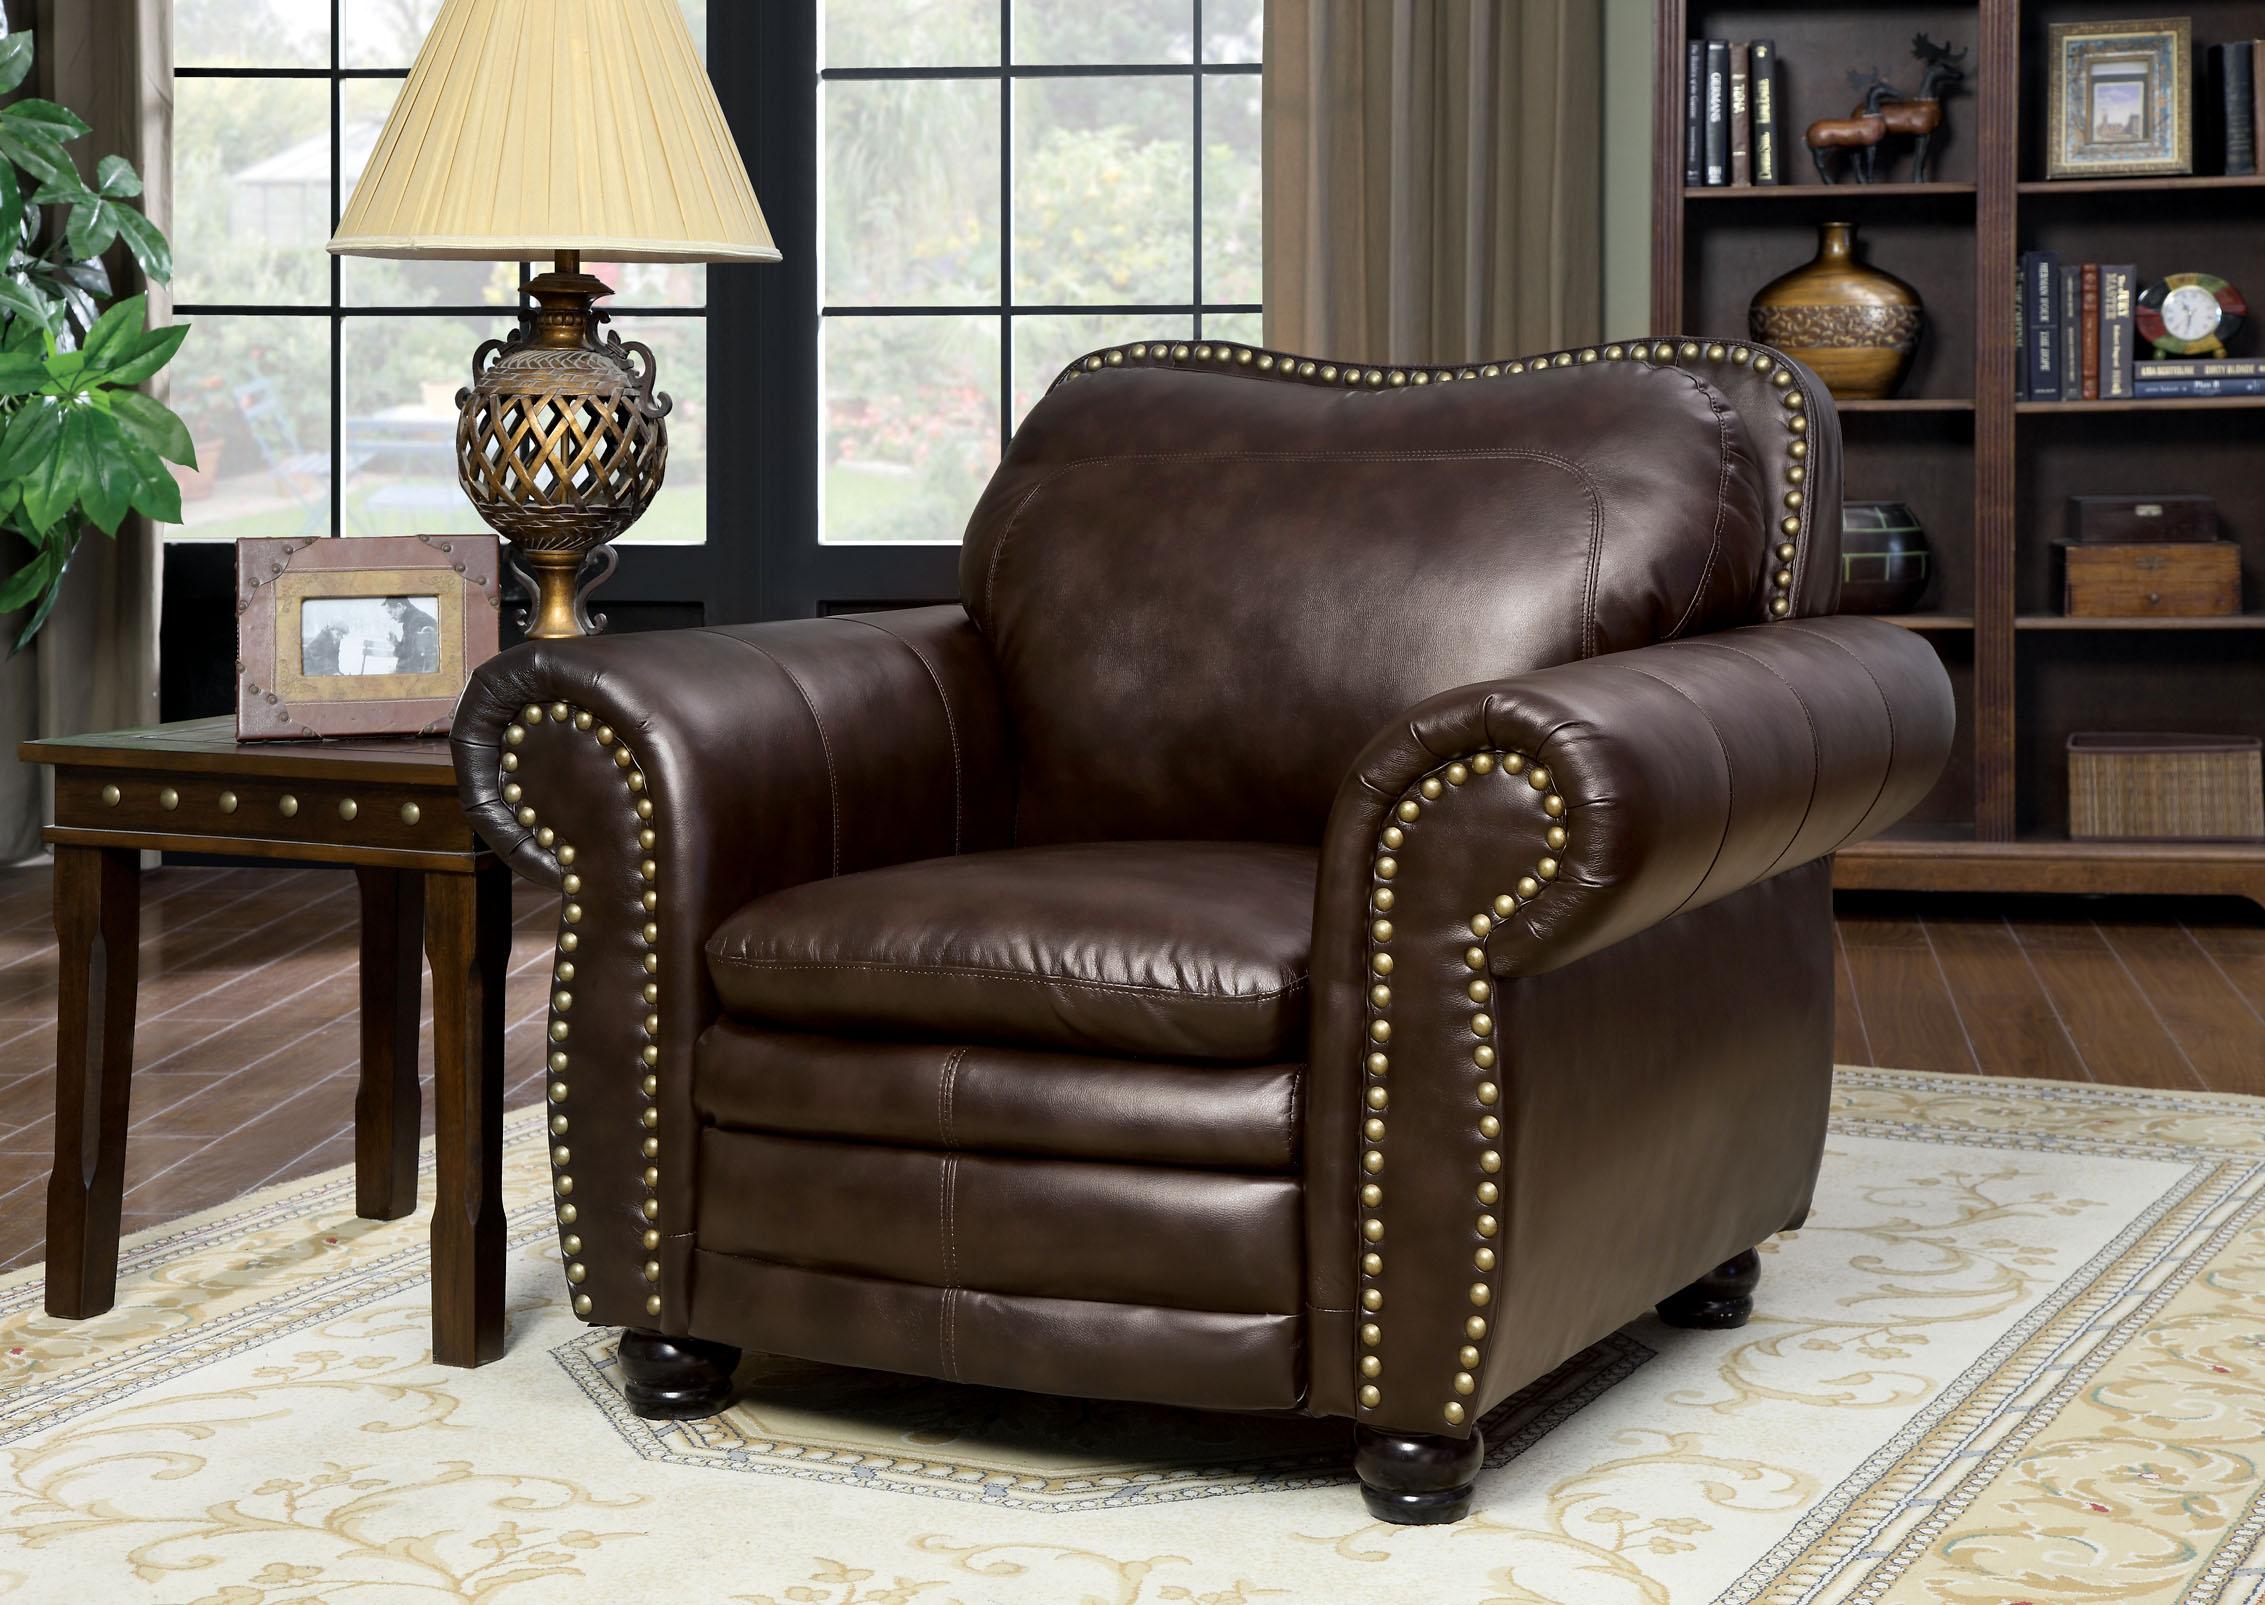 Furniture of America Dark Brown Poran Faux Leather Arm Chair